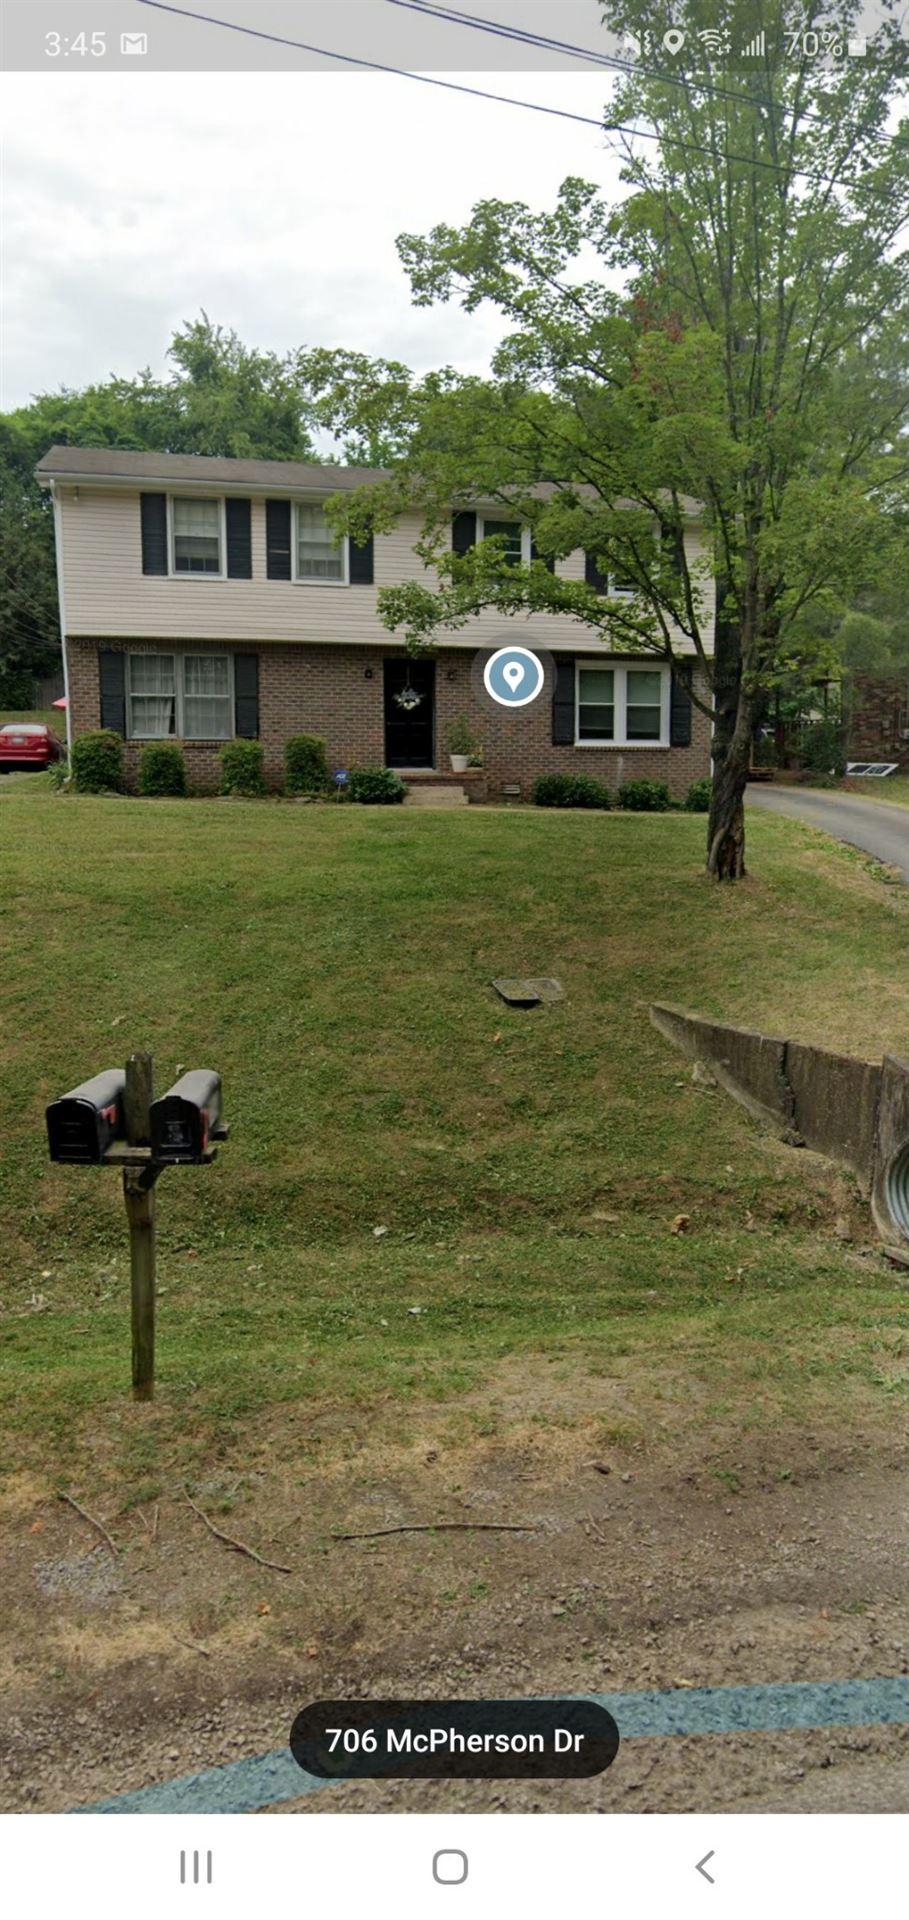 741 McPherson Dr, Nashville, TN 37221 - MLS#: 2189456